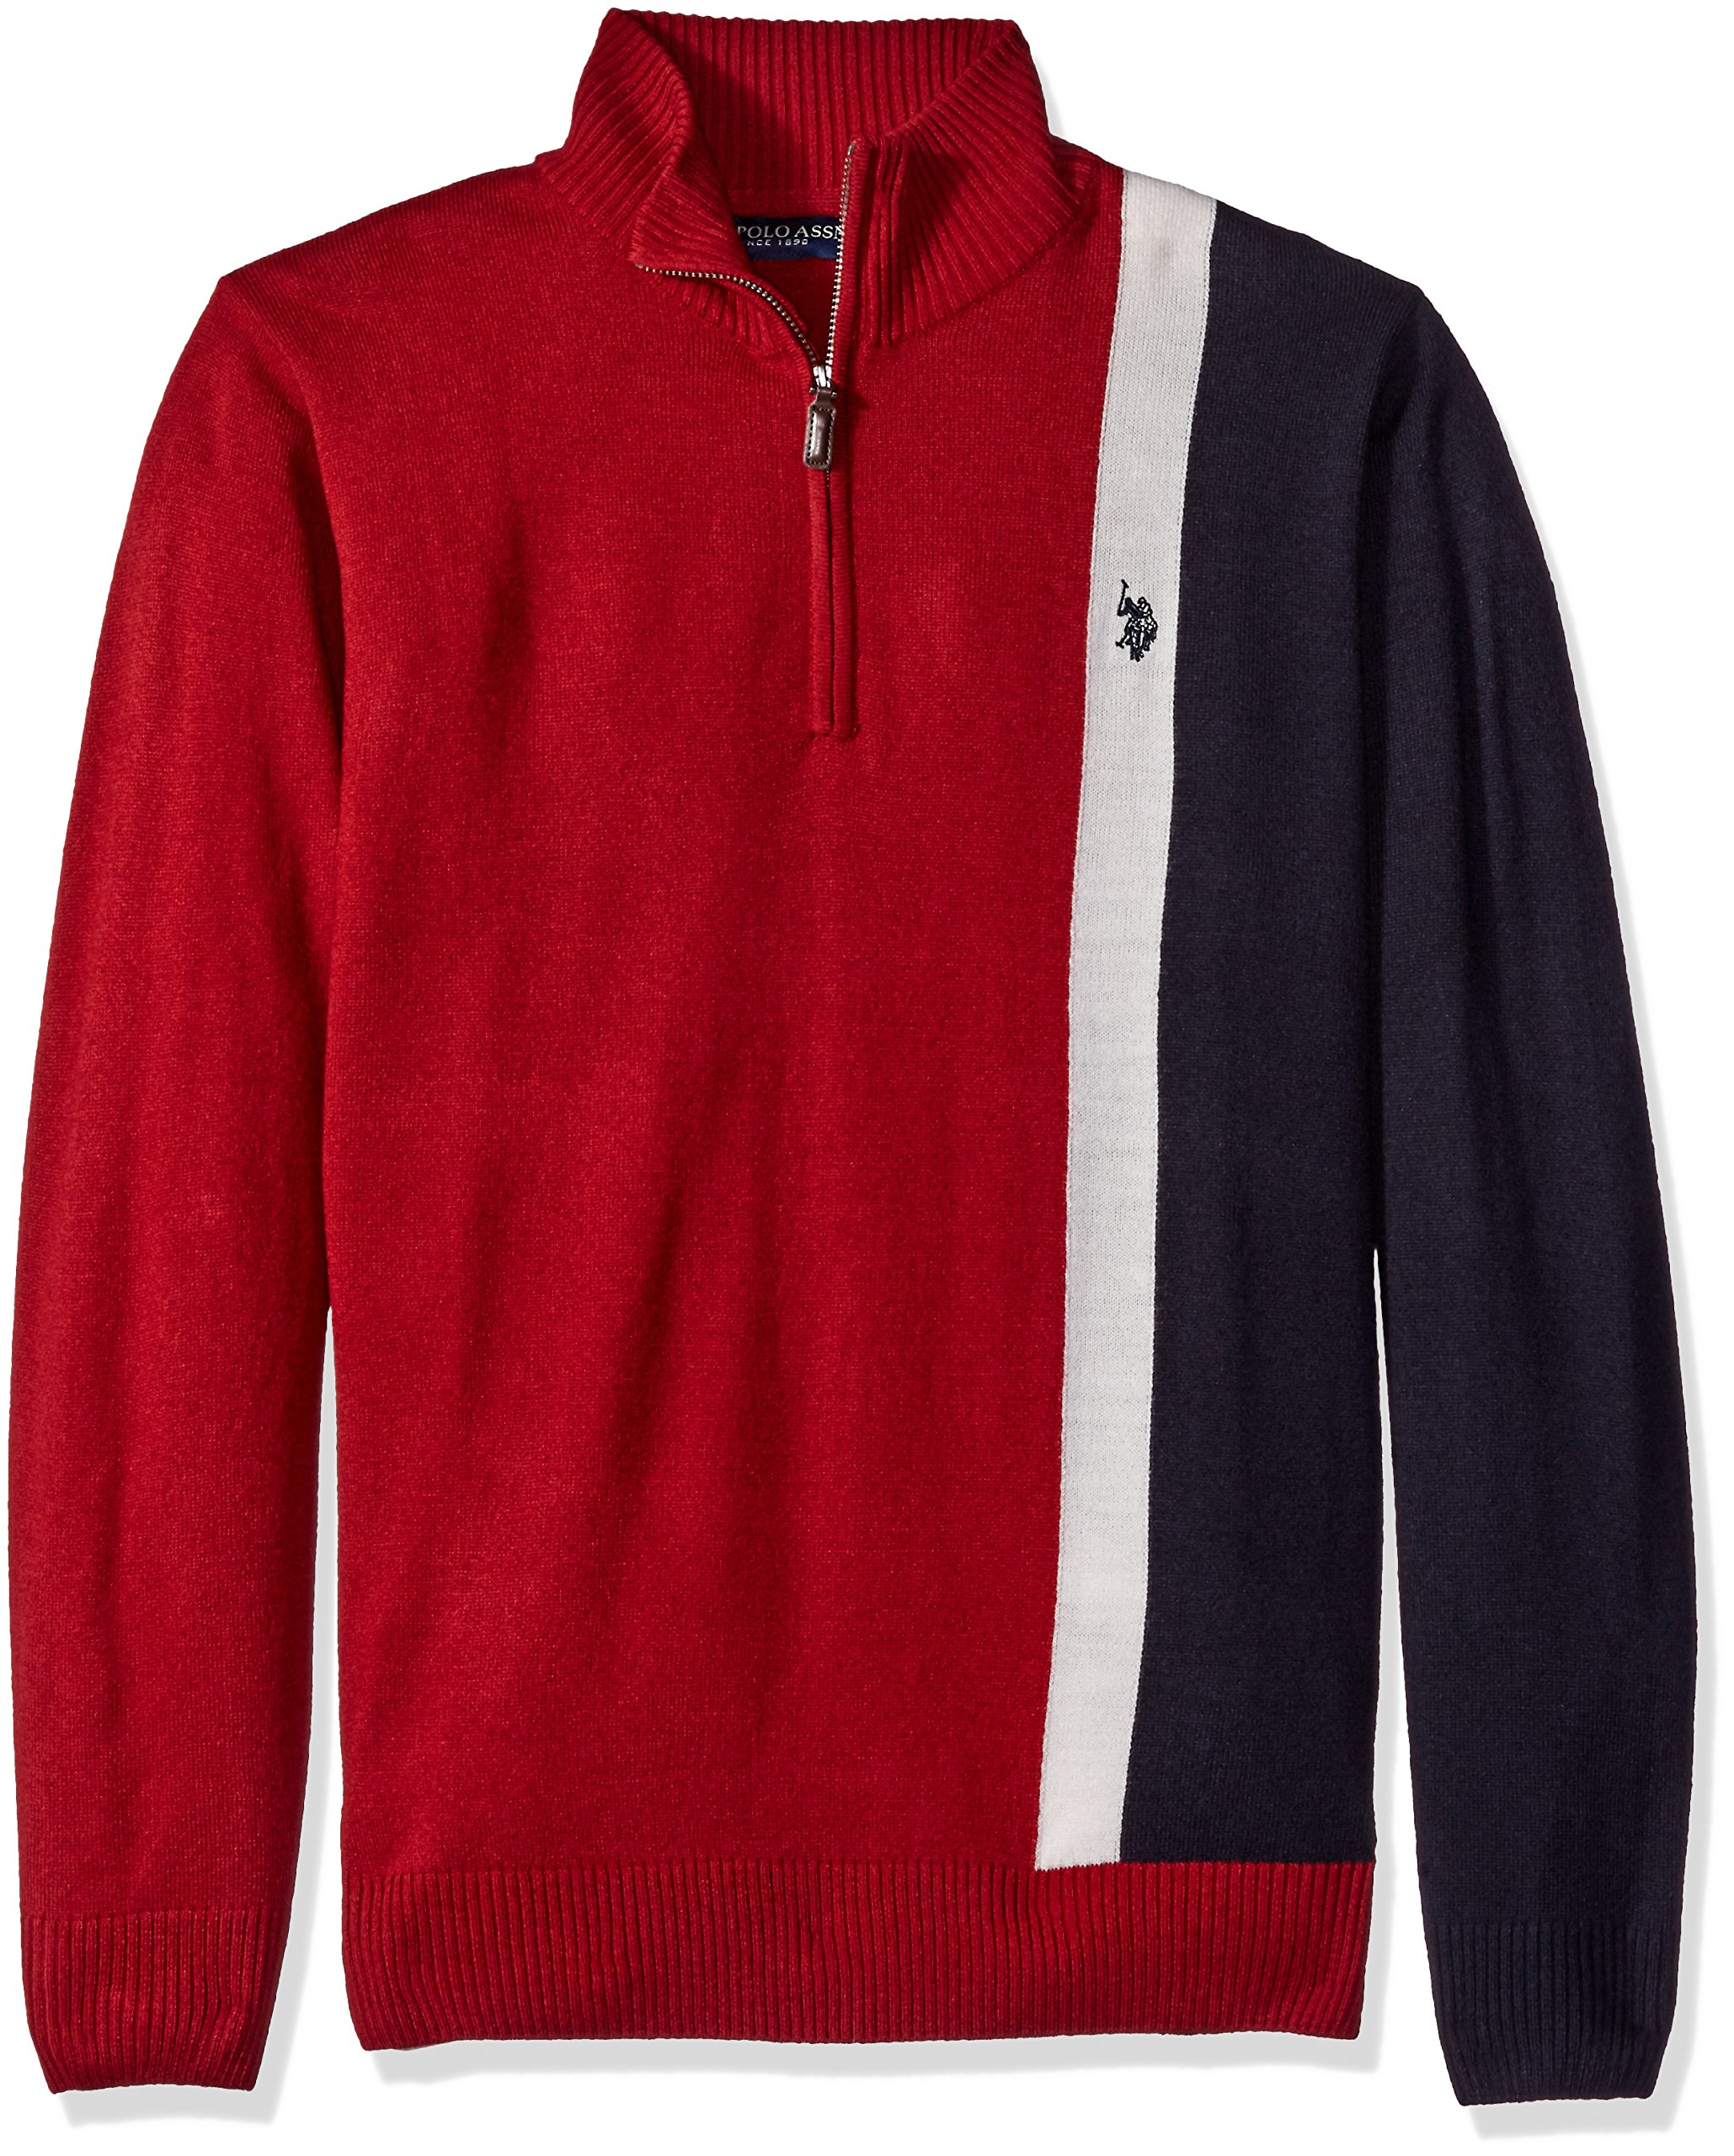 U.S. Polo Assn. Men's Vertical Striped 1/4 Zip Sweater, Red, X-Large